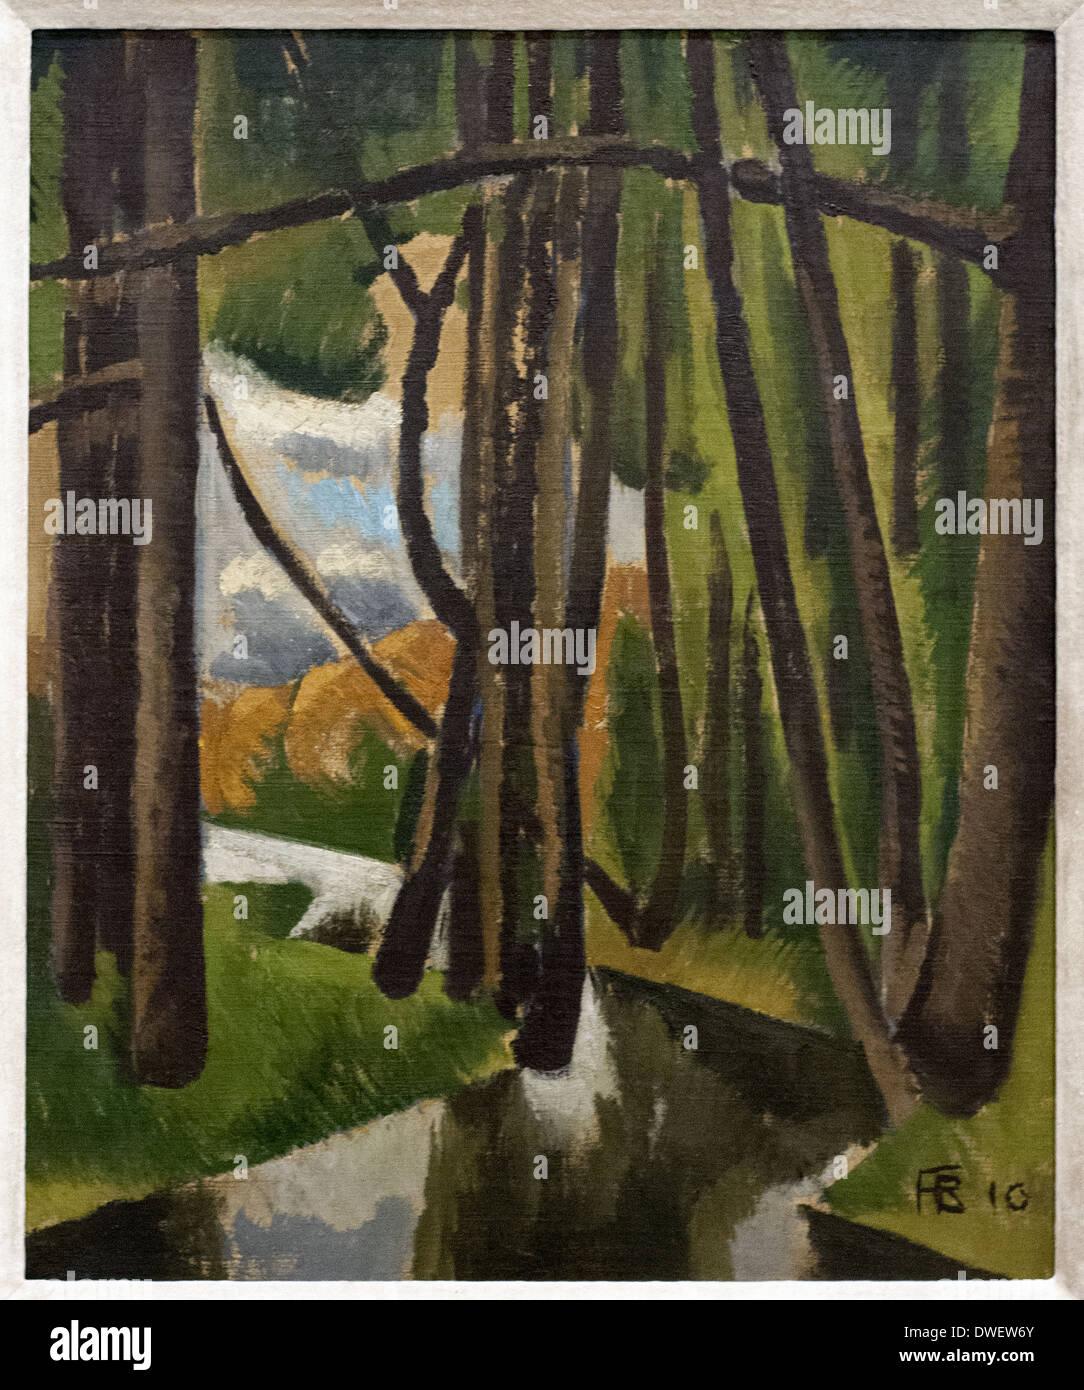 Roger de la Fresnaye - sous bois - 1910 - Museo di Arte Moderna di Parigi Immagini Stock